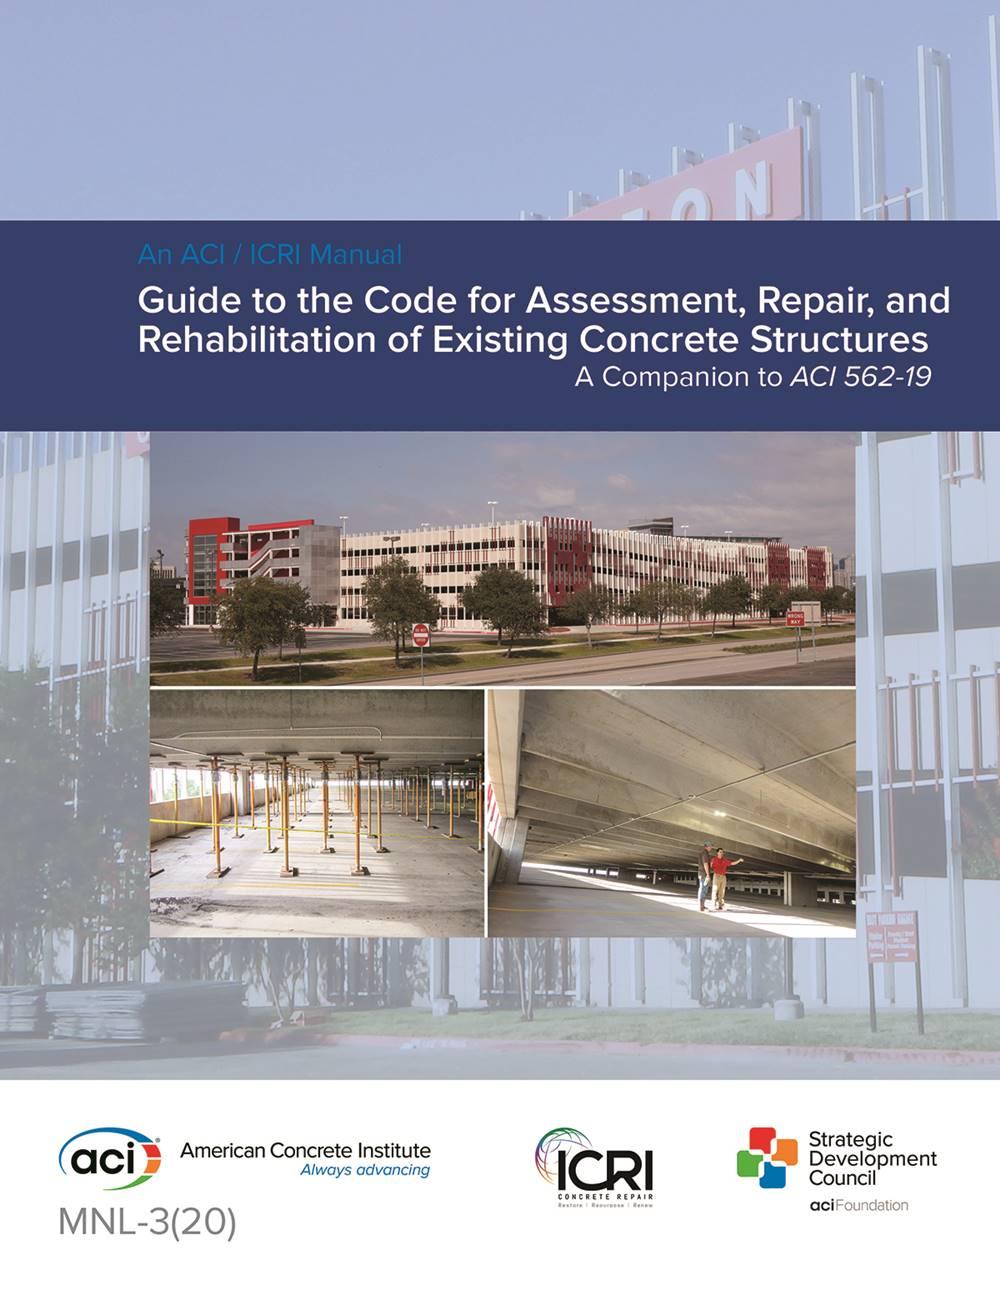 ACI and ICRI Publish New Guide